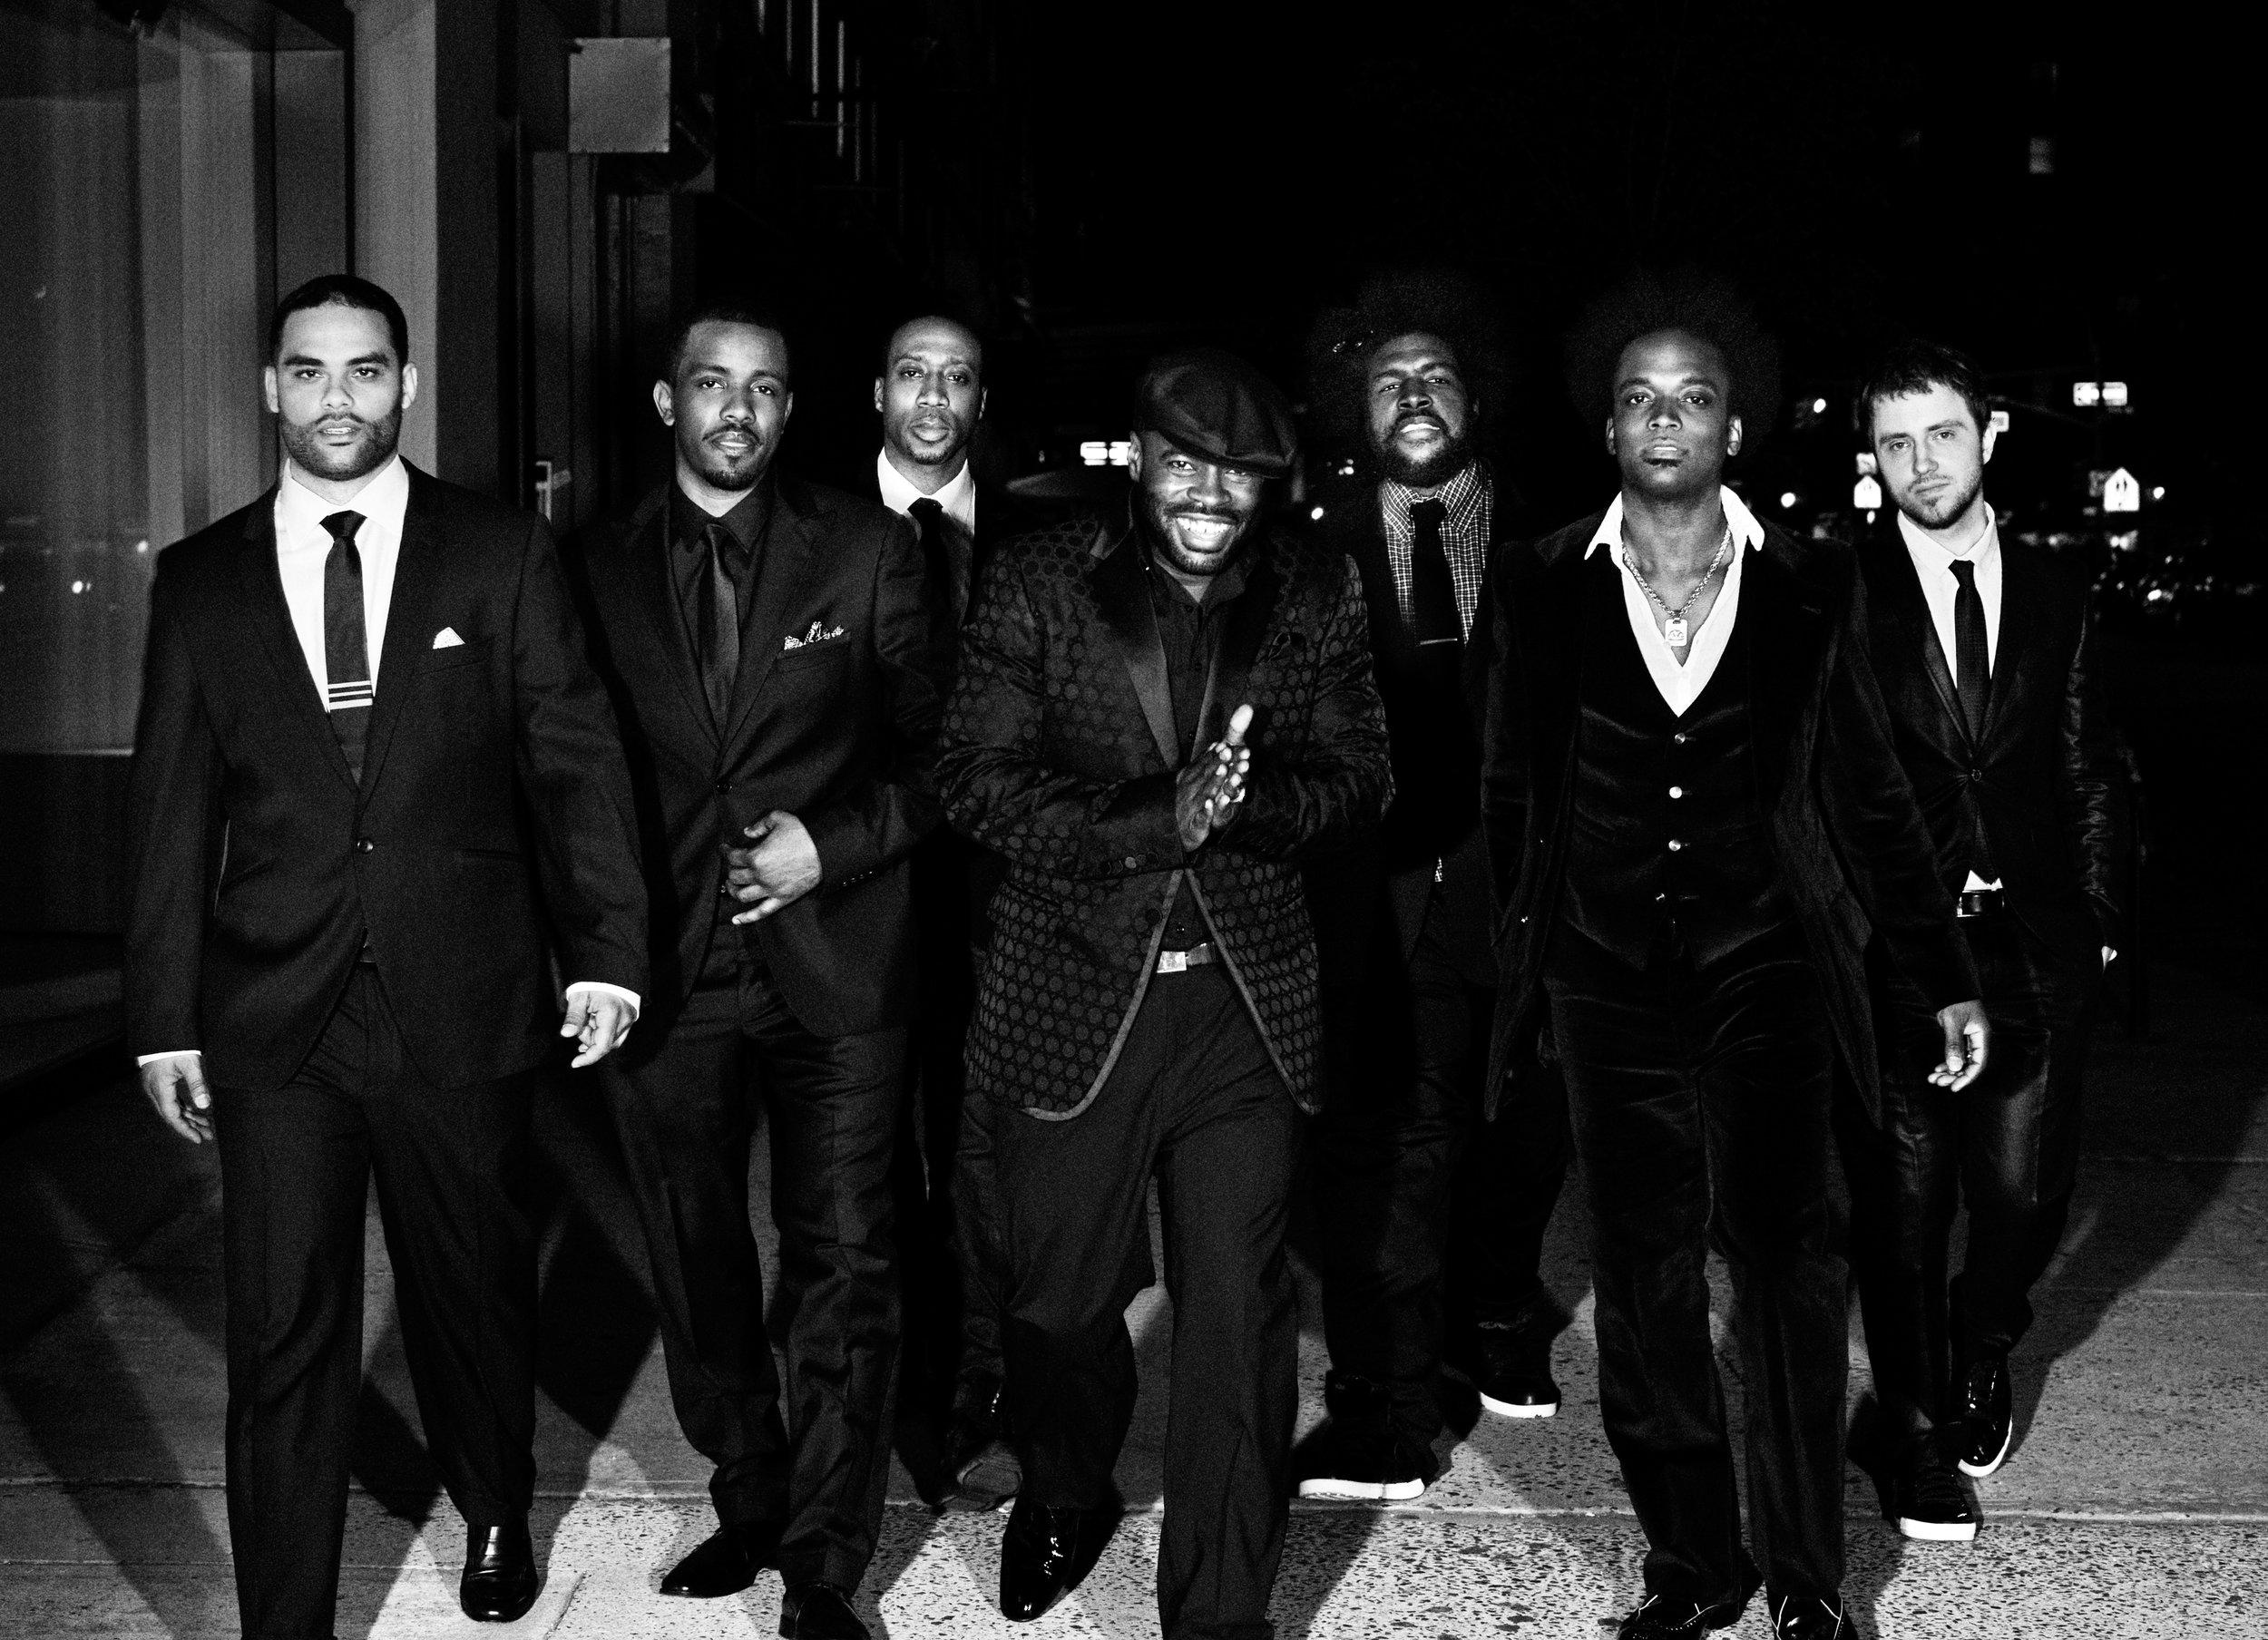 The Roots_Ben Watts Photographer_Rebecca Pietri Stylist _Group_B:W_1.jpg